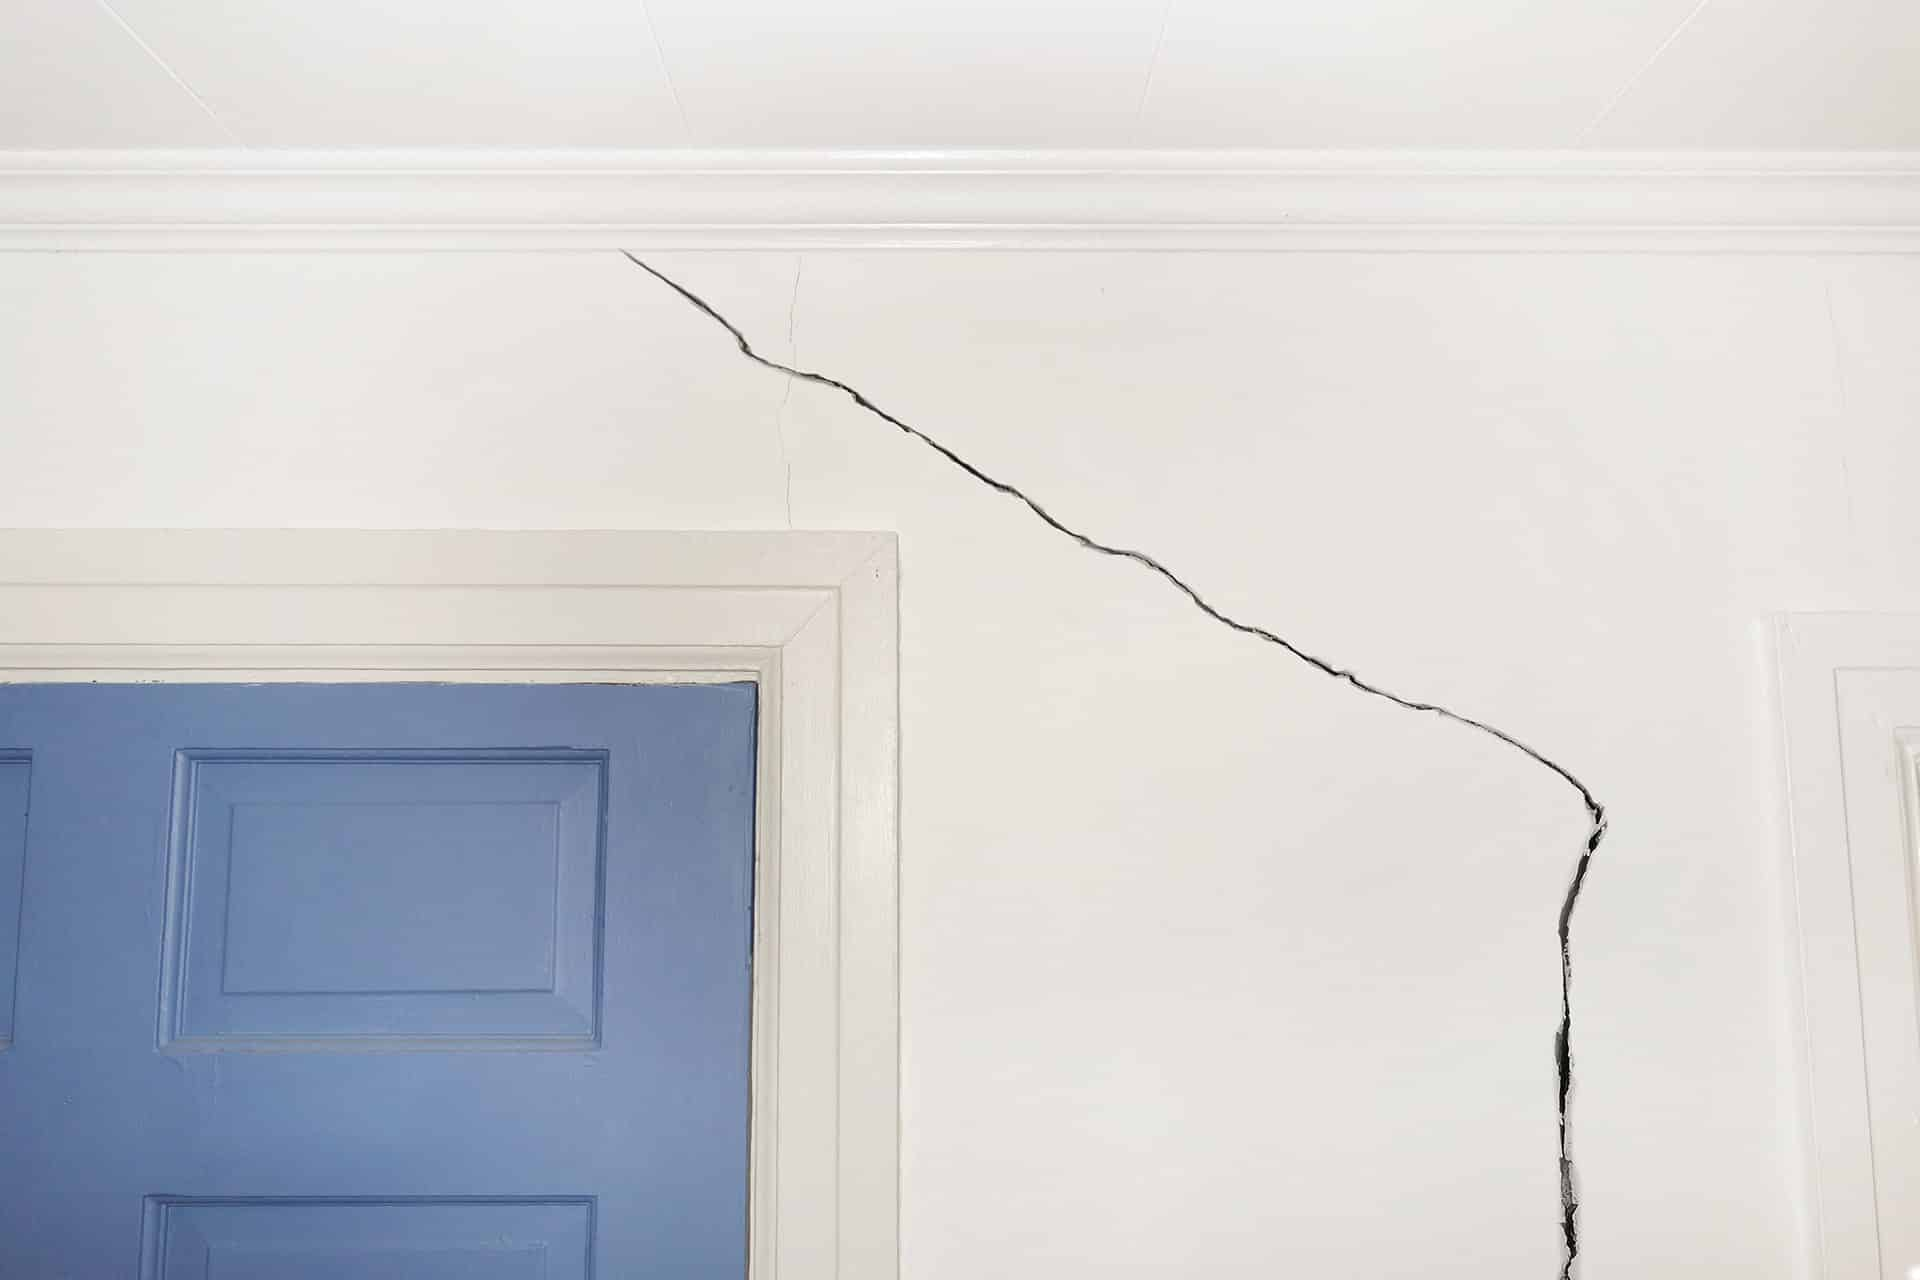 Interior Dry Wall Crack